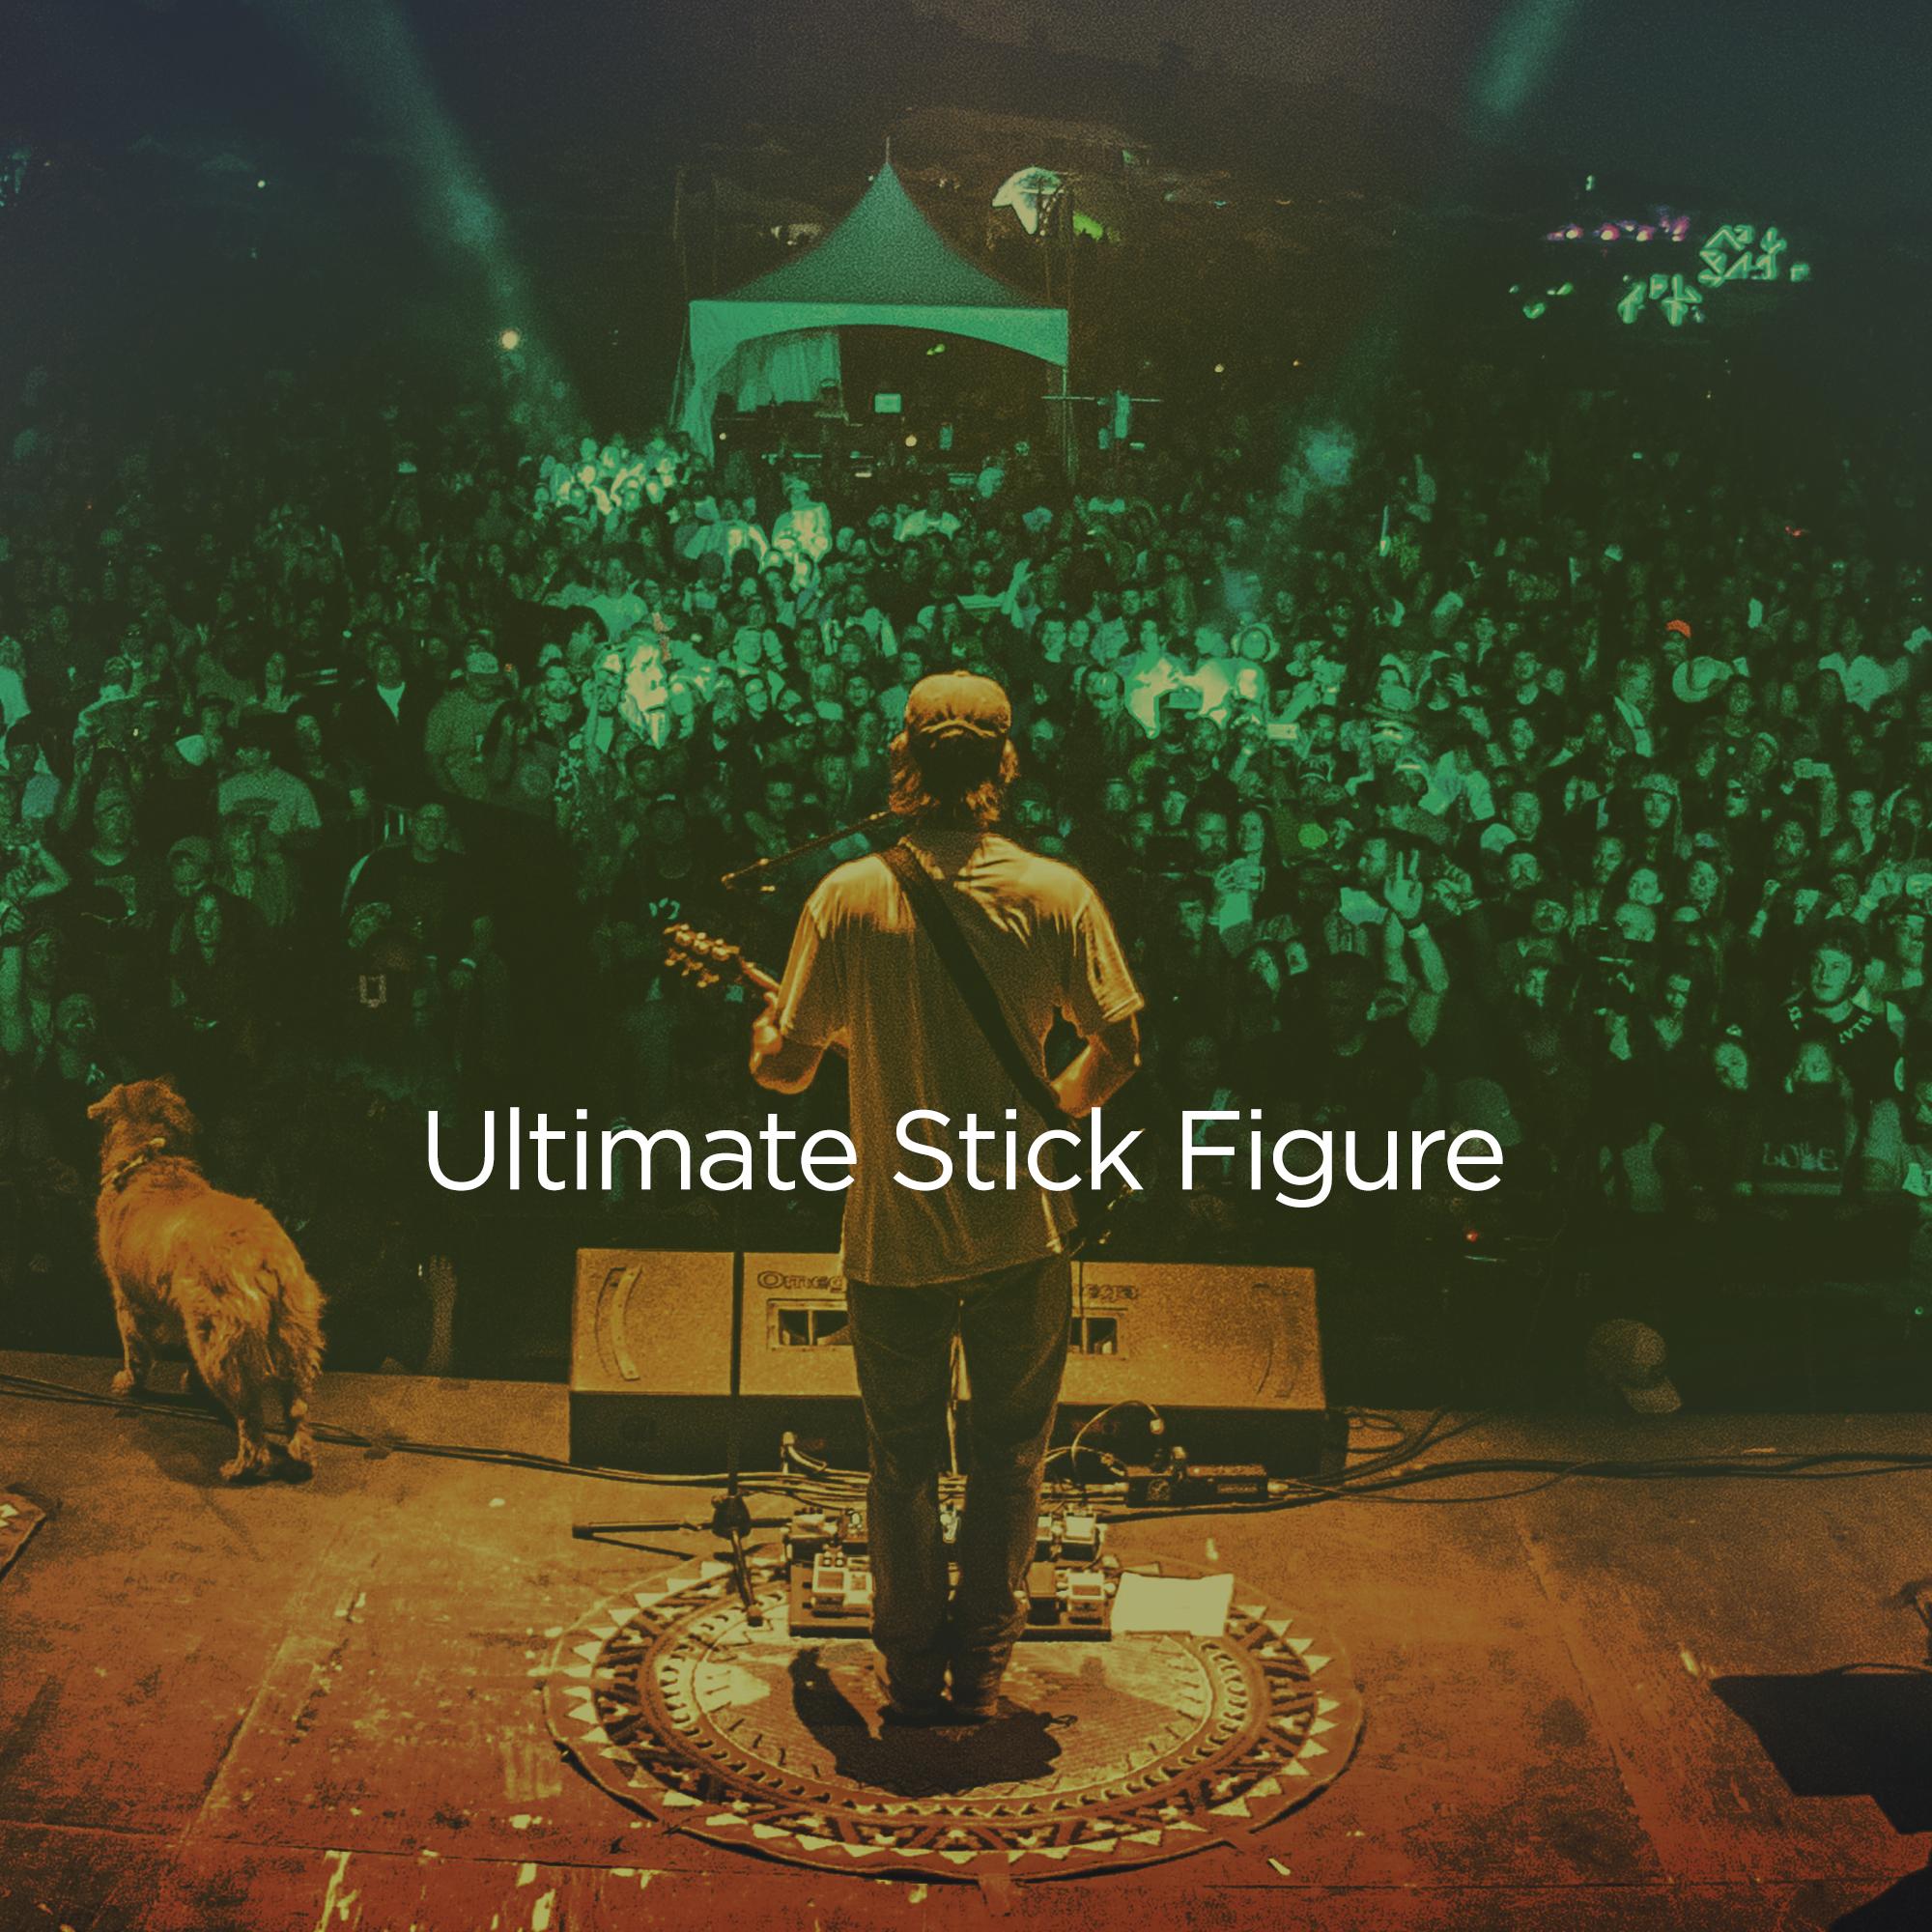 UltimateStickFigure.jpg